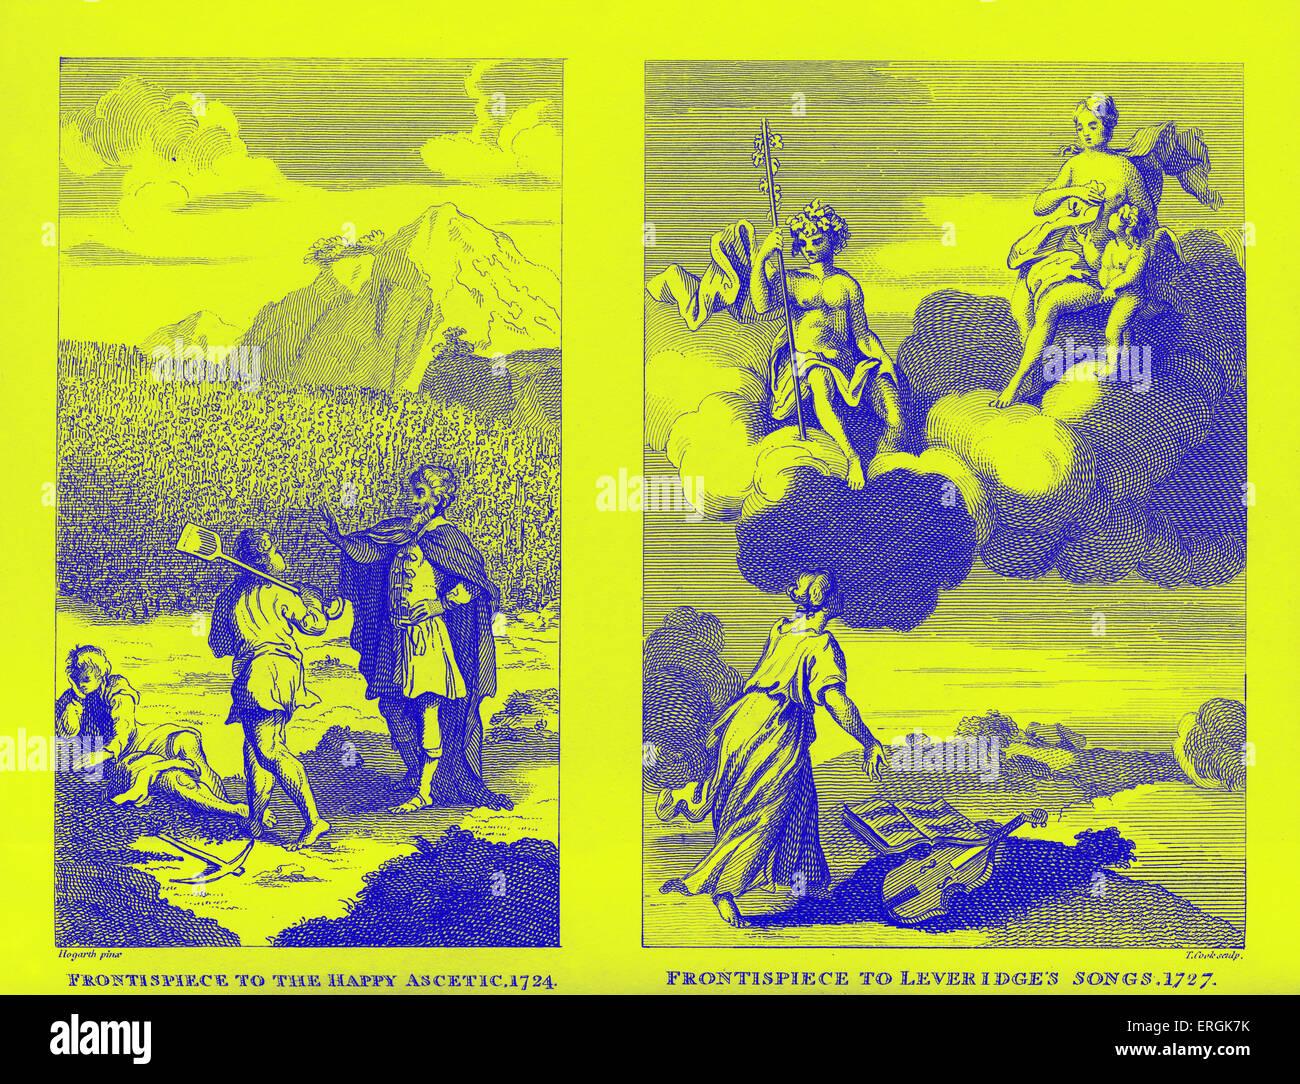 Leveridge 's songs' frontispiecey by William Hogarth 1727 WH:  English painter, printmaker,   satirist, - Stock Image